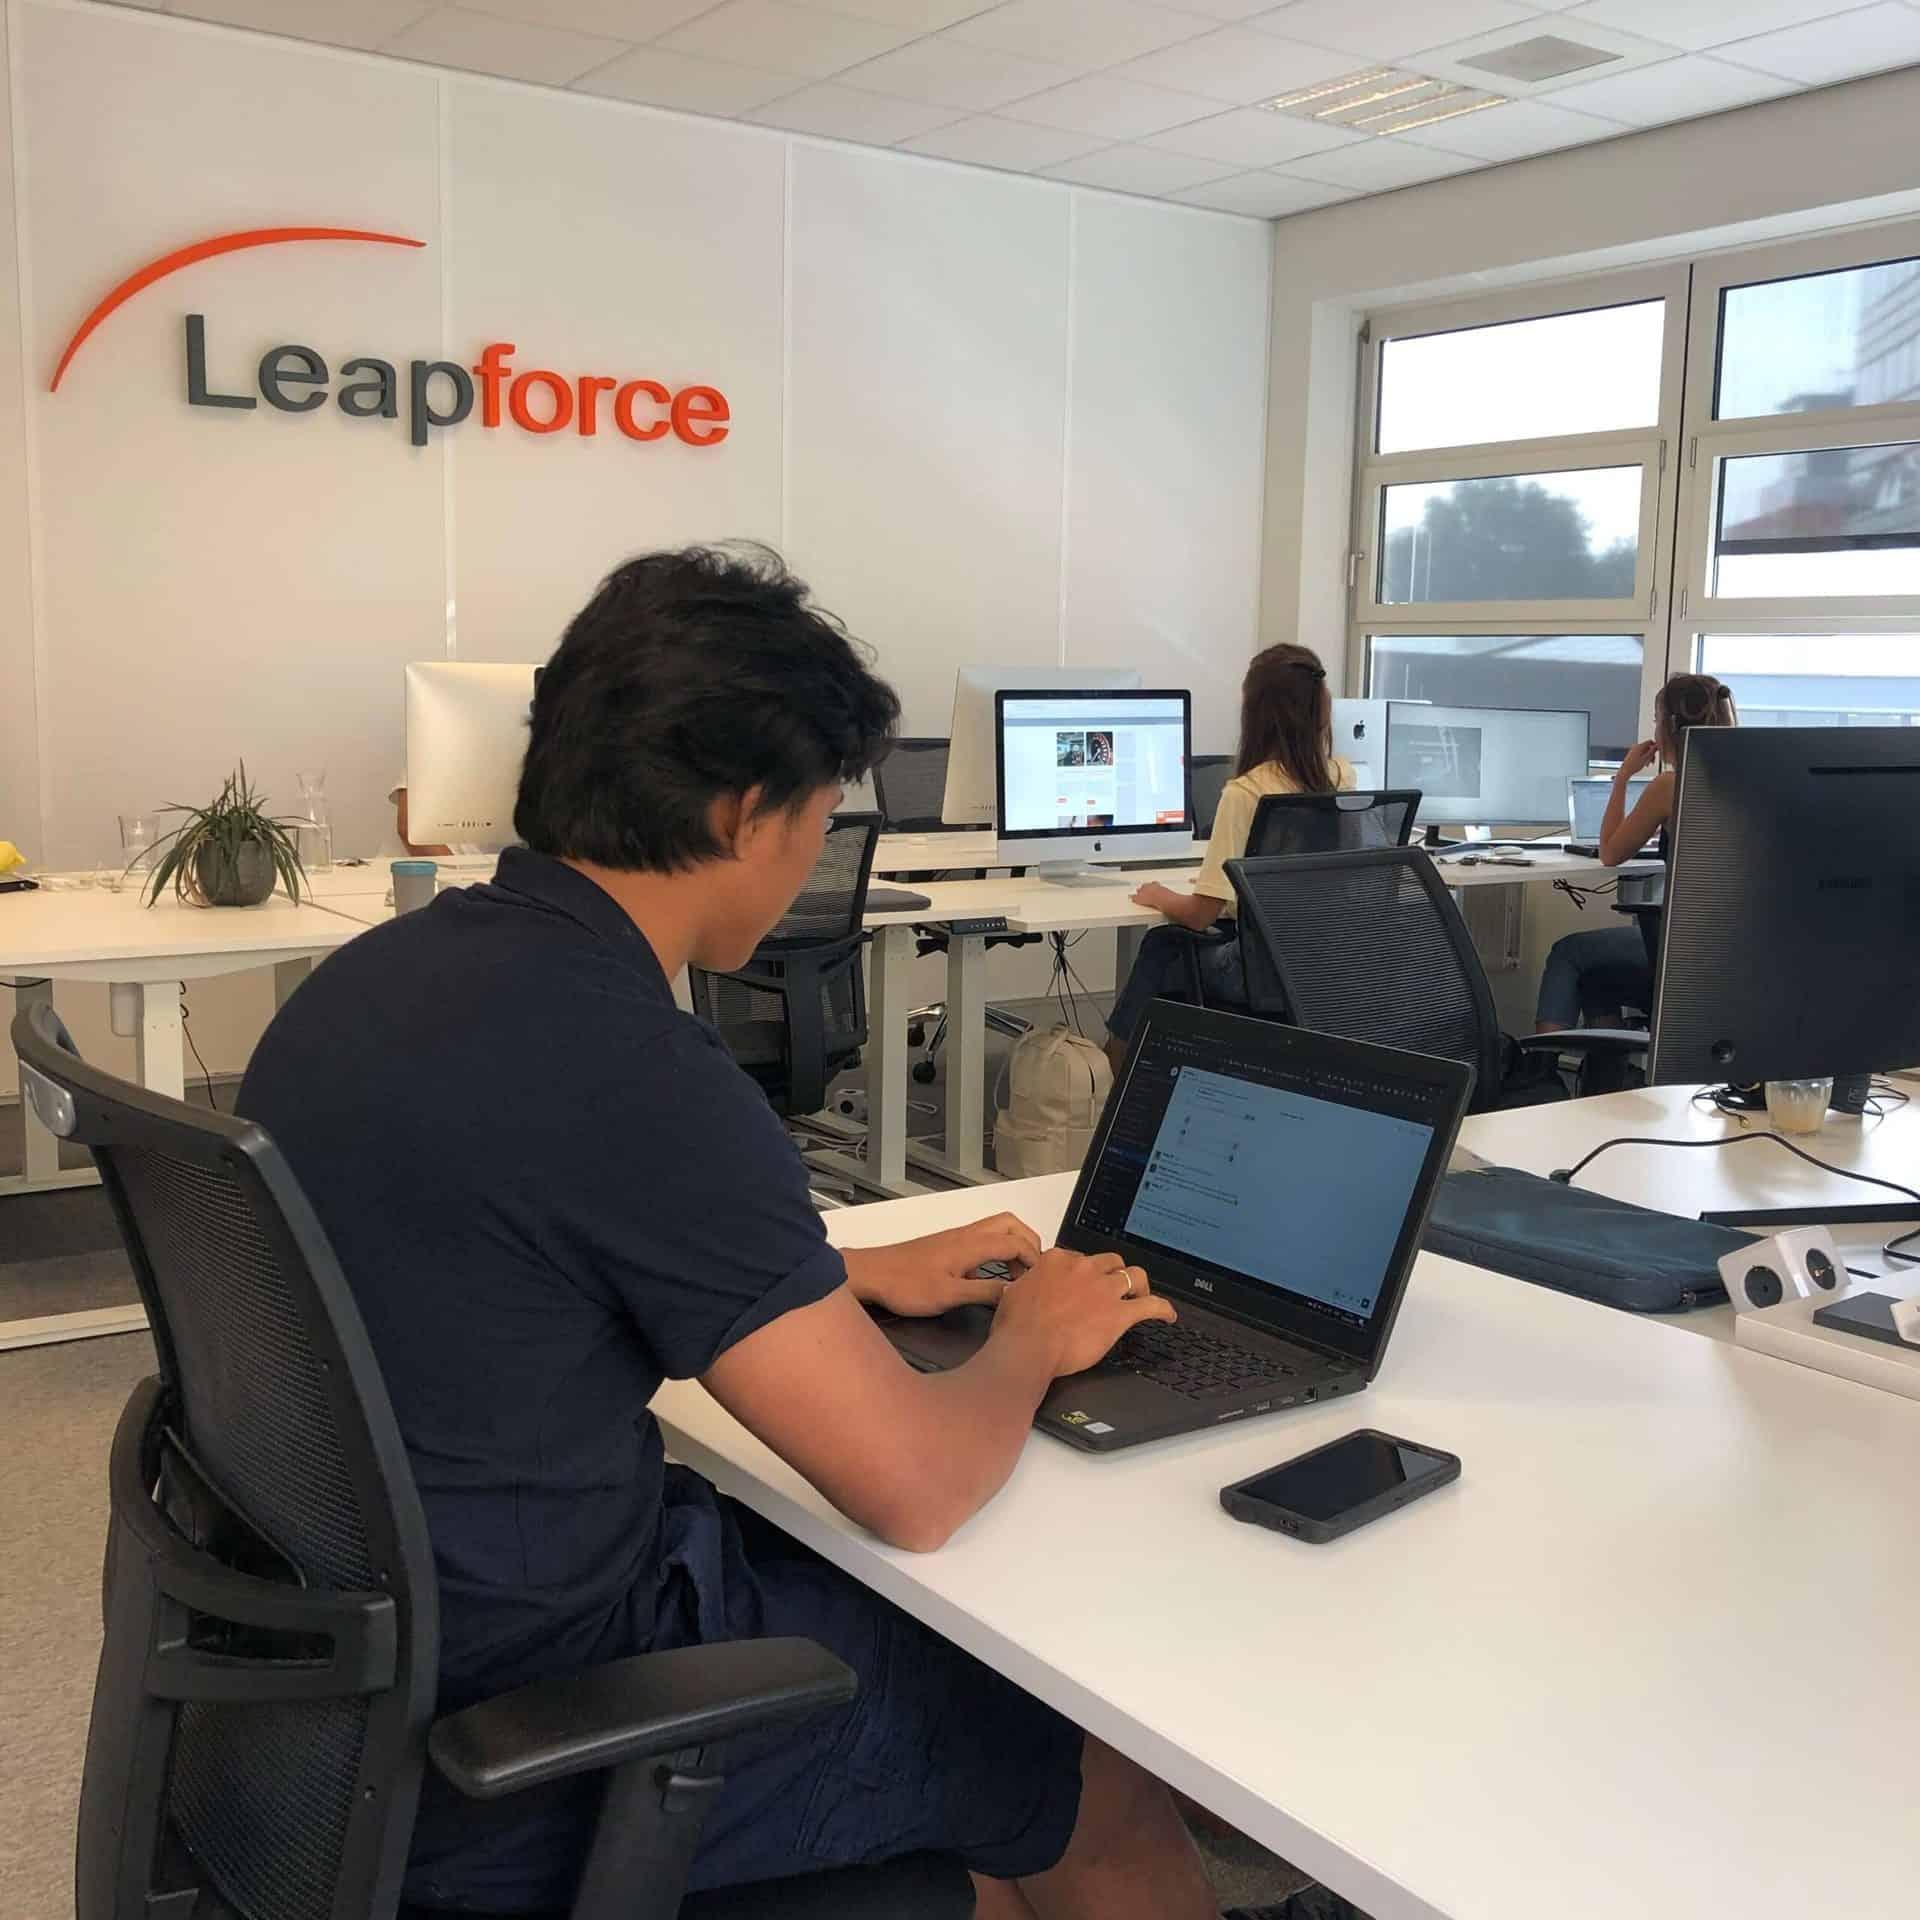 Leapforce marketing agency